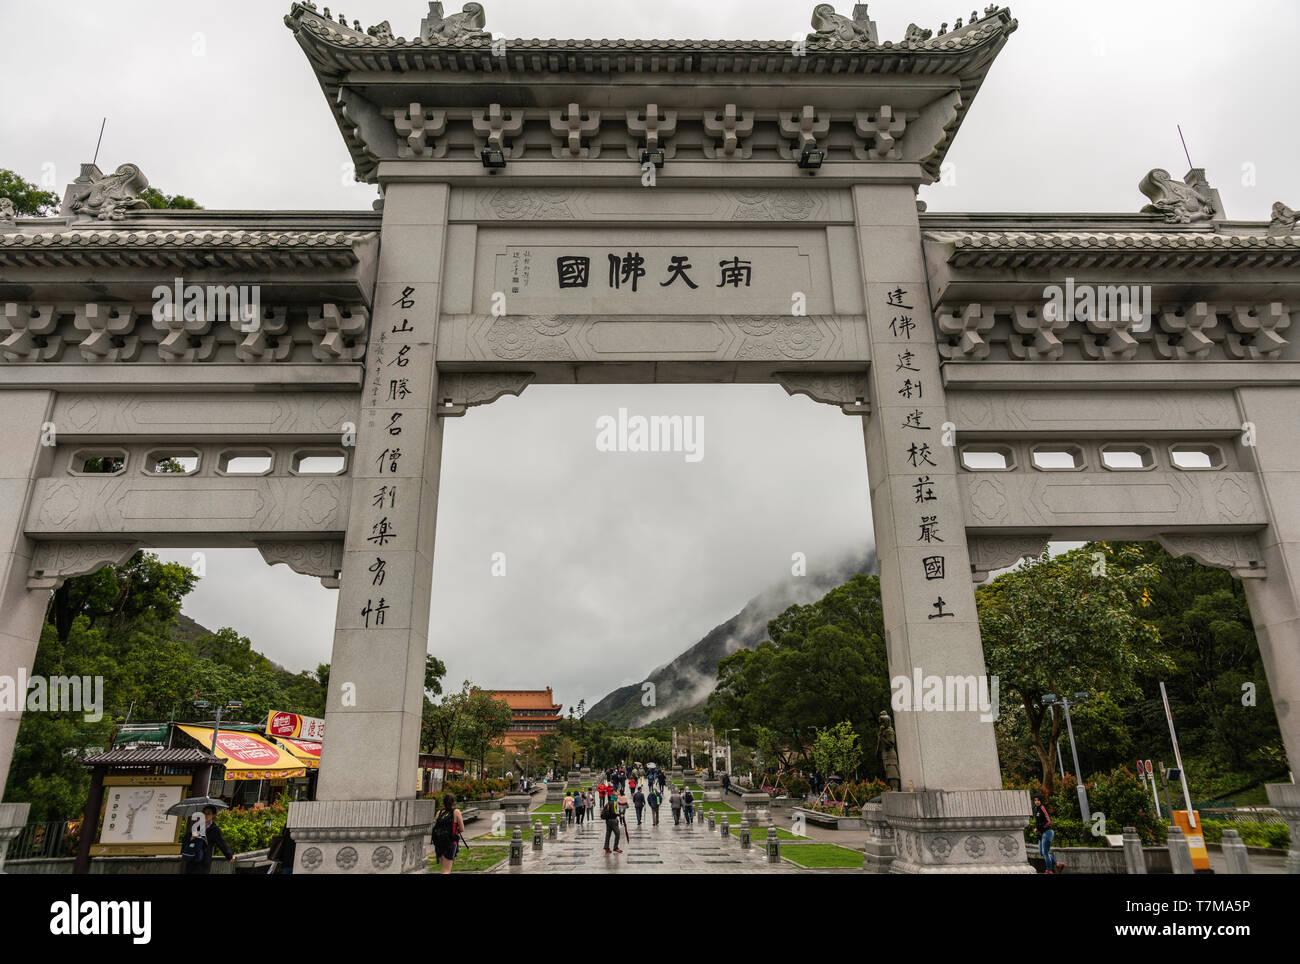 Hong Kong, China - March 7, 2019: Lantau Island, Po Lin Buddhis Monastery. Monumental gray entrance gate to the domain. Rainy conditions, green hills  - Stock Image